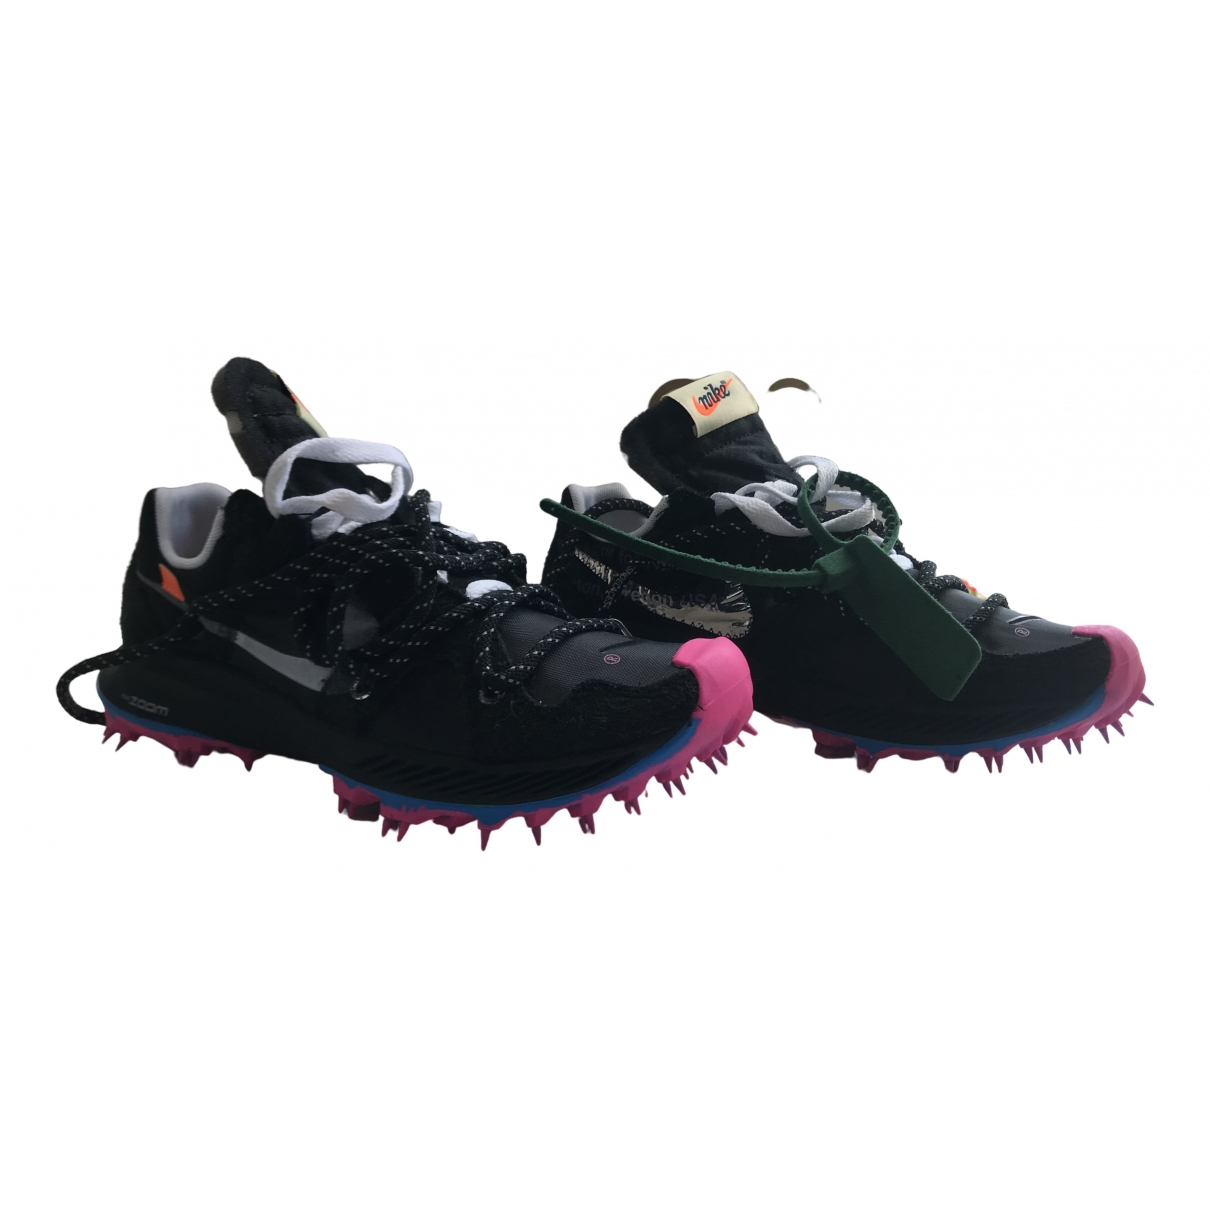 Nike X Off-white Zoom Terra Kiger 5 Sneakers in  Schwarz Polyester